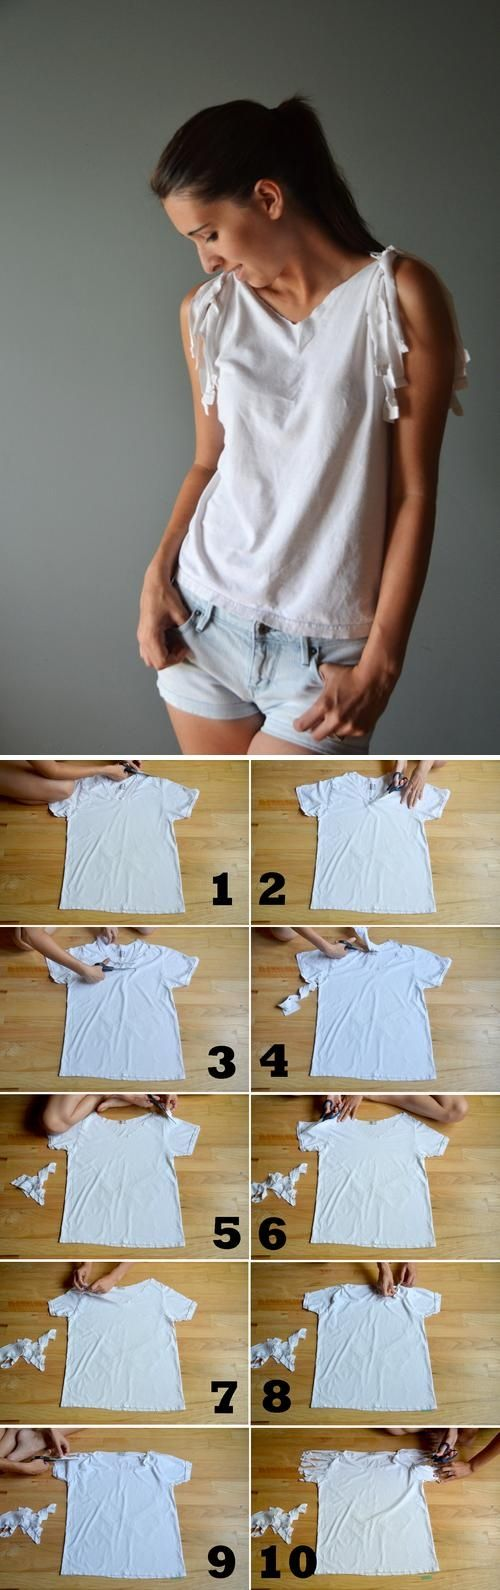 DIY T- Shirt Redesign : shredded / laser-cutting (cut out) 改造 T 恤的好點子第二集 01